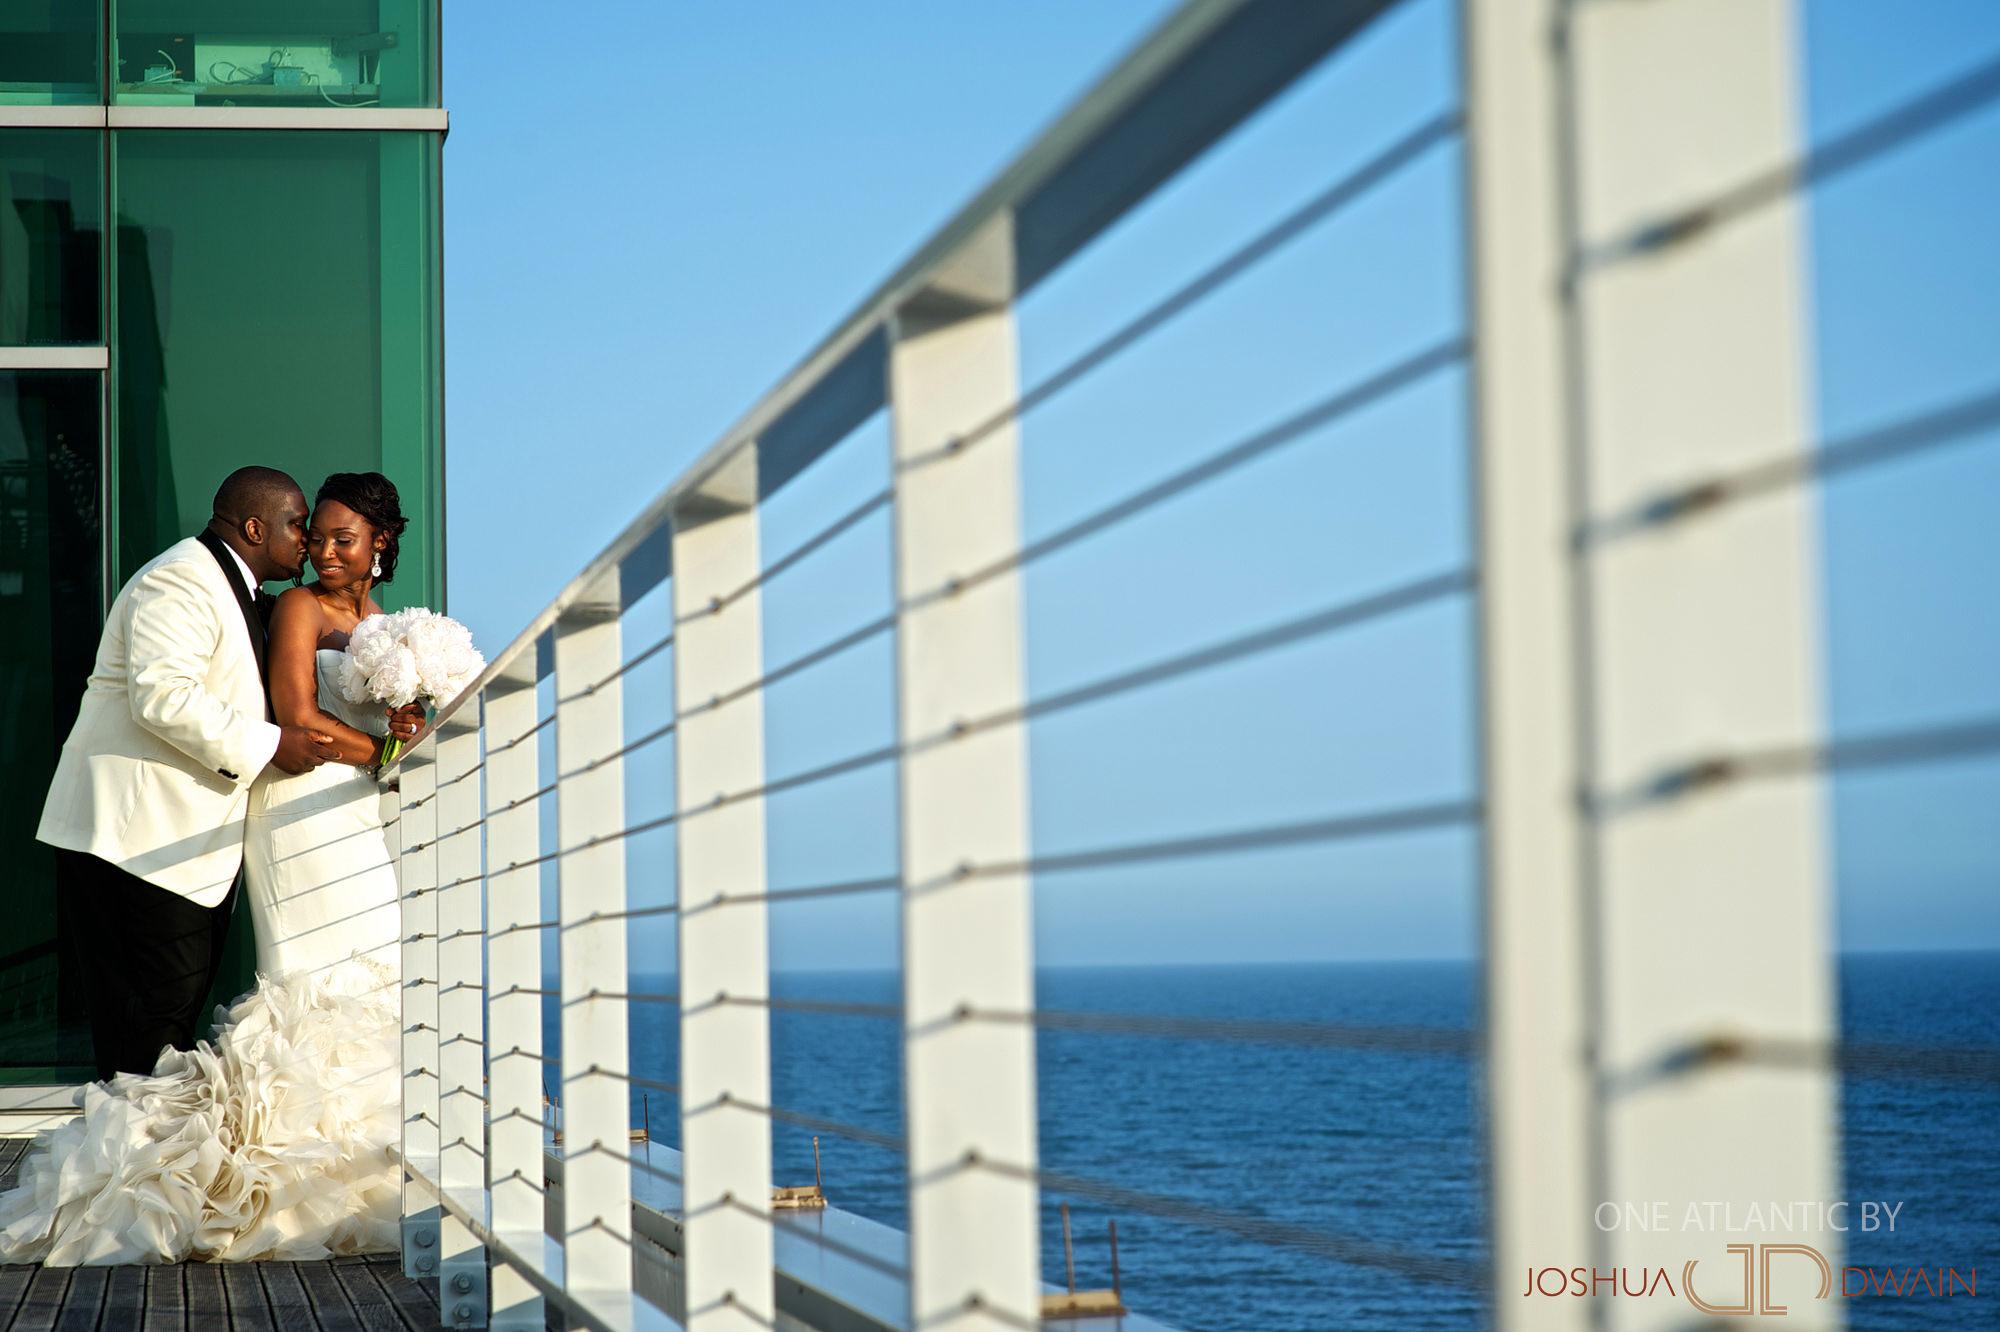 one-atlantic-venue-joshua-dwain-photography-003